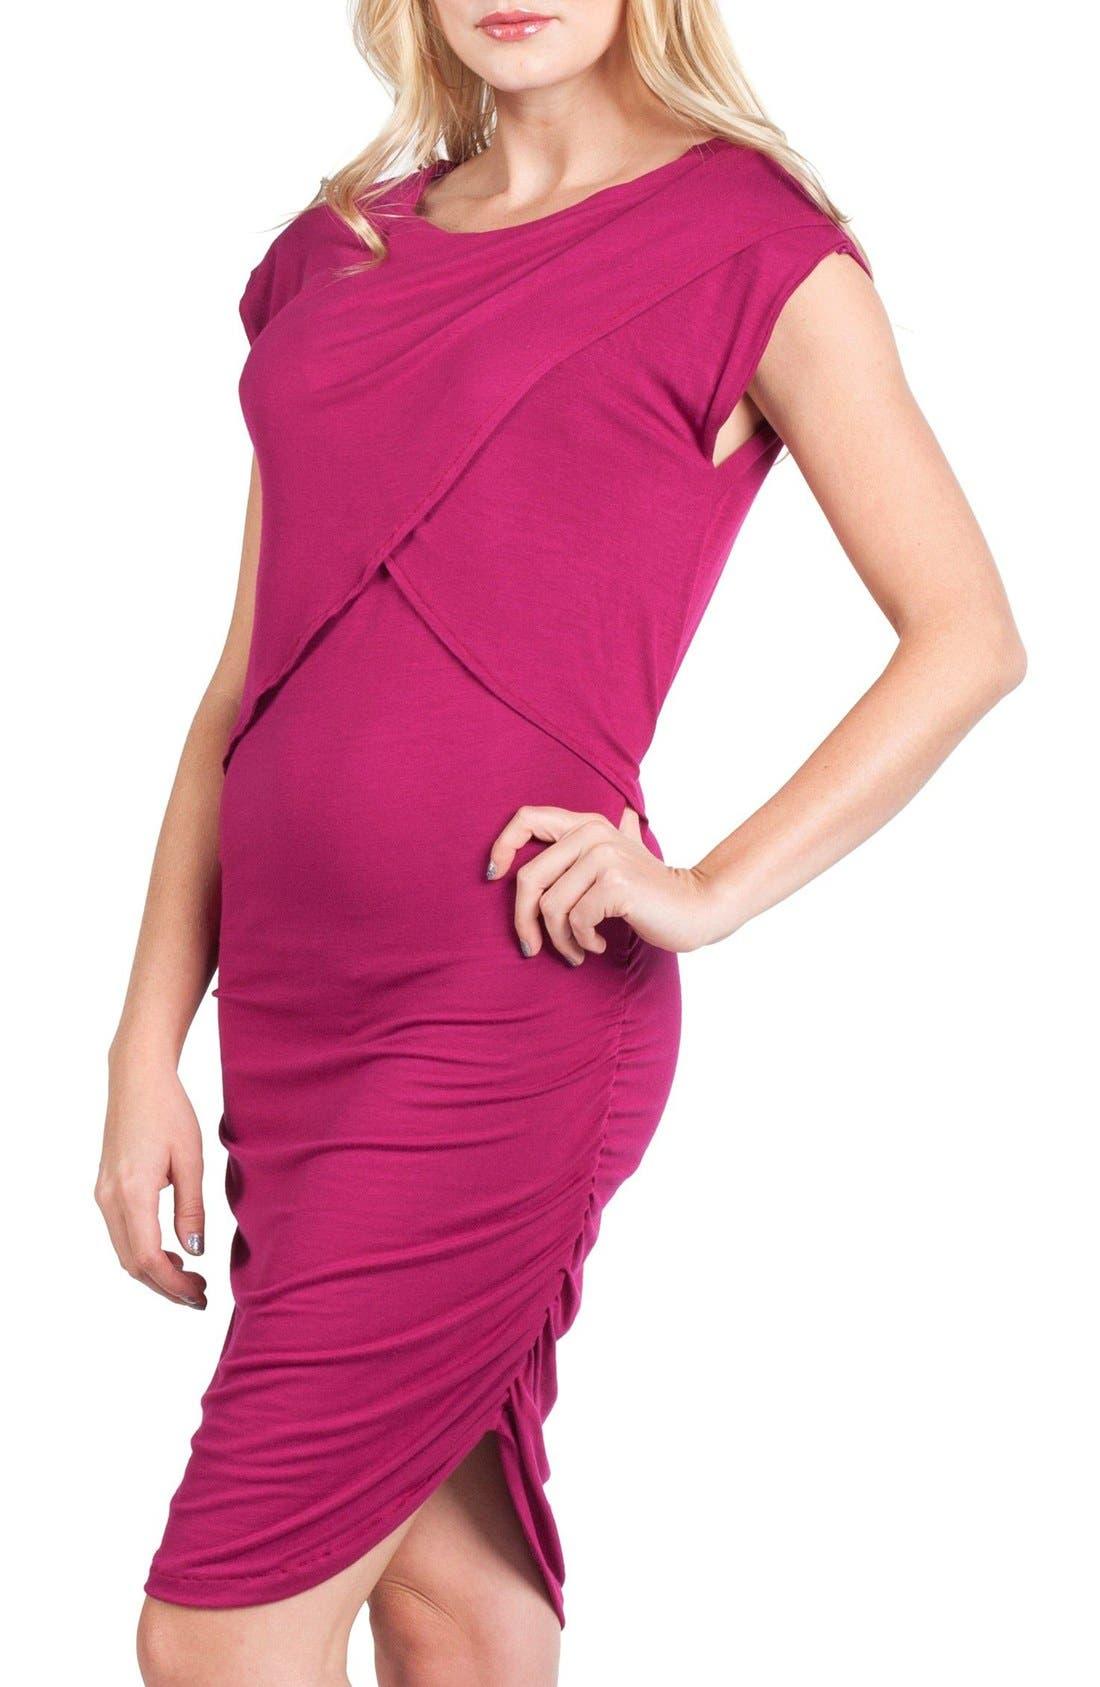 Alternate Image 2  - Savi Mom Miami Crossover Maternity/Nursing Sheath Dress